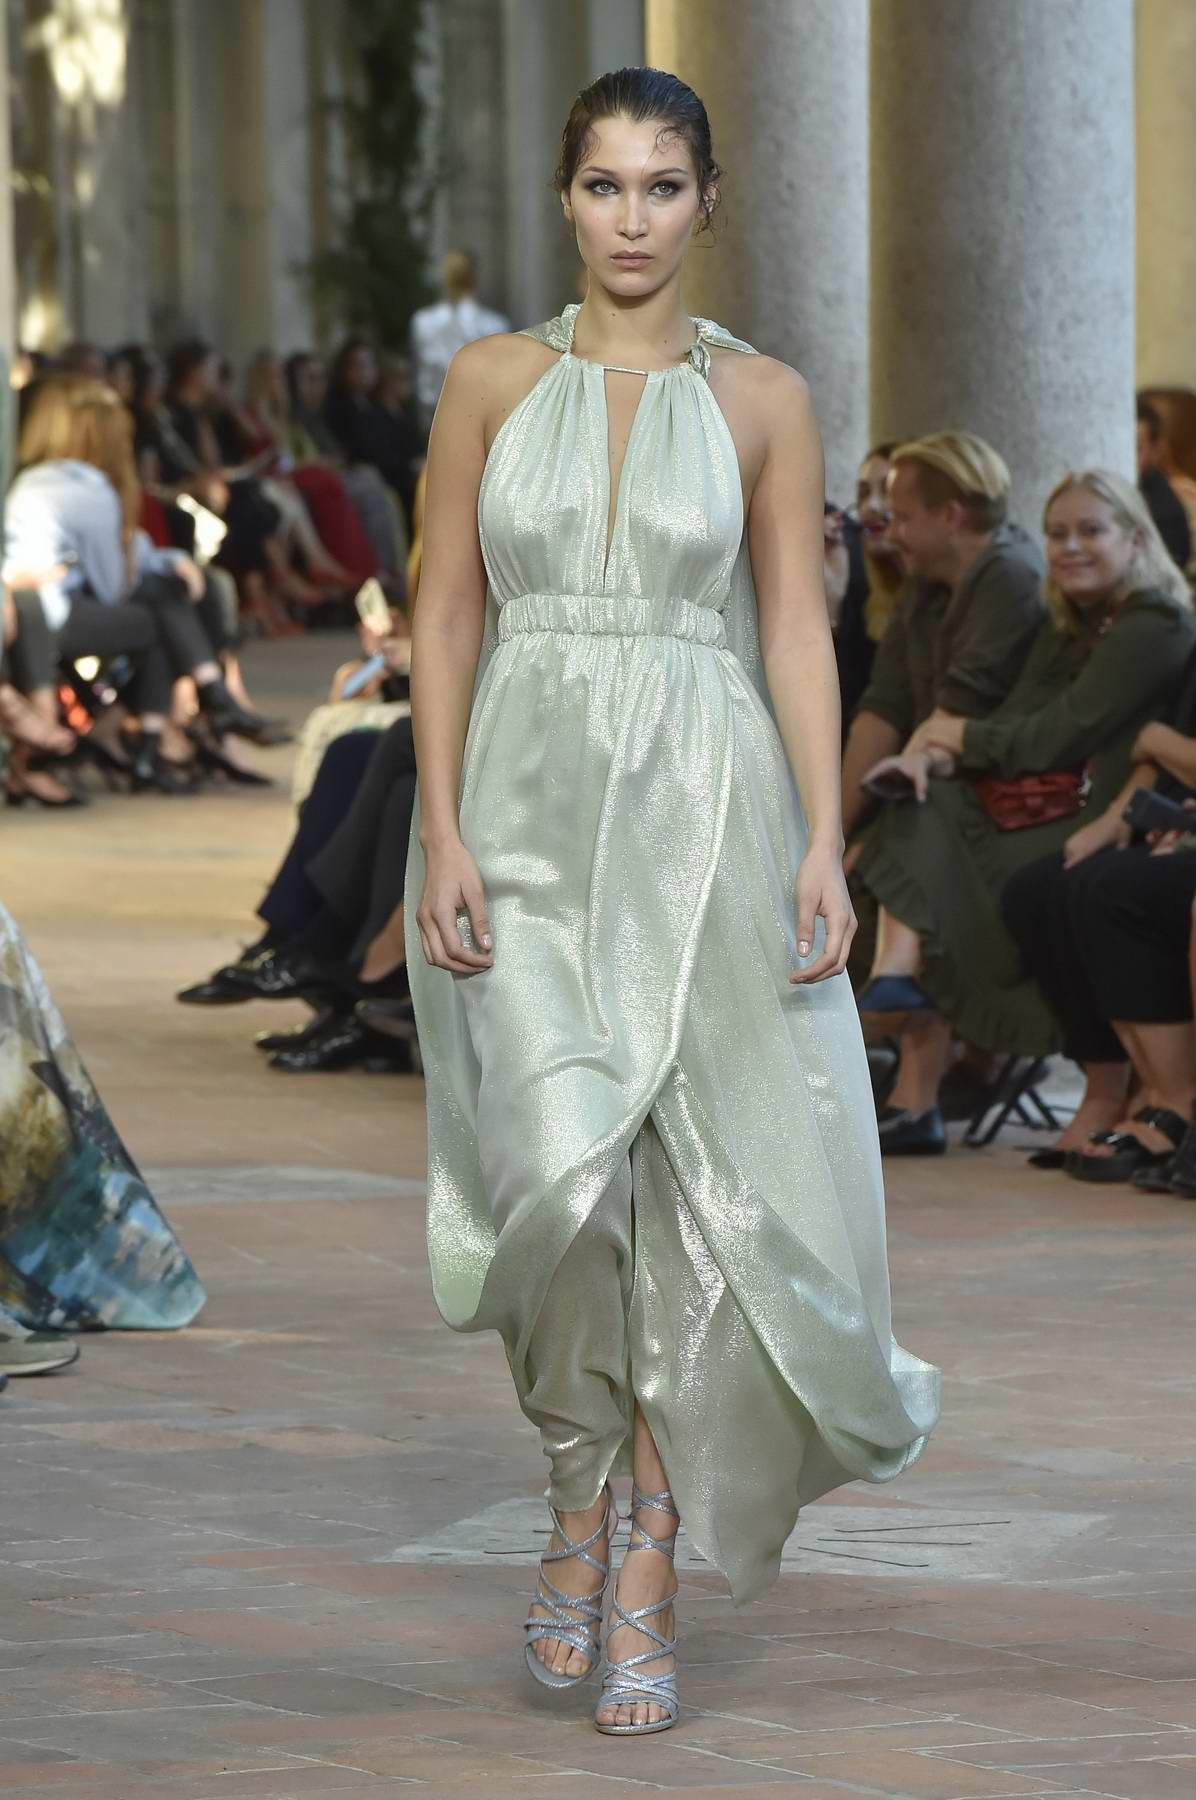 Bella Hadid walking for Alberta Ferretti fashion show during Milan Fashion Week, Italy